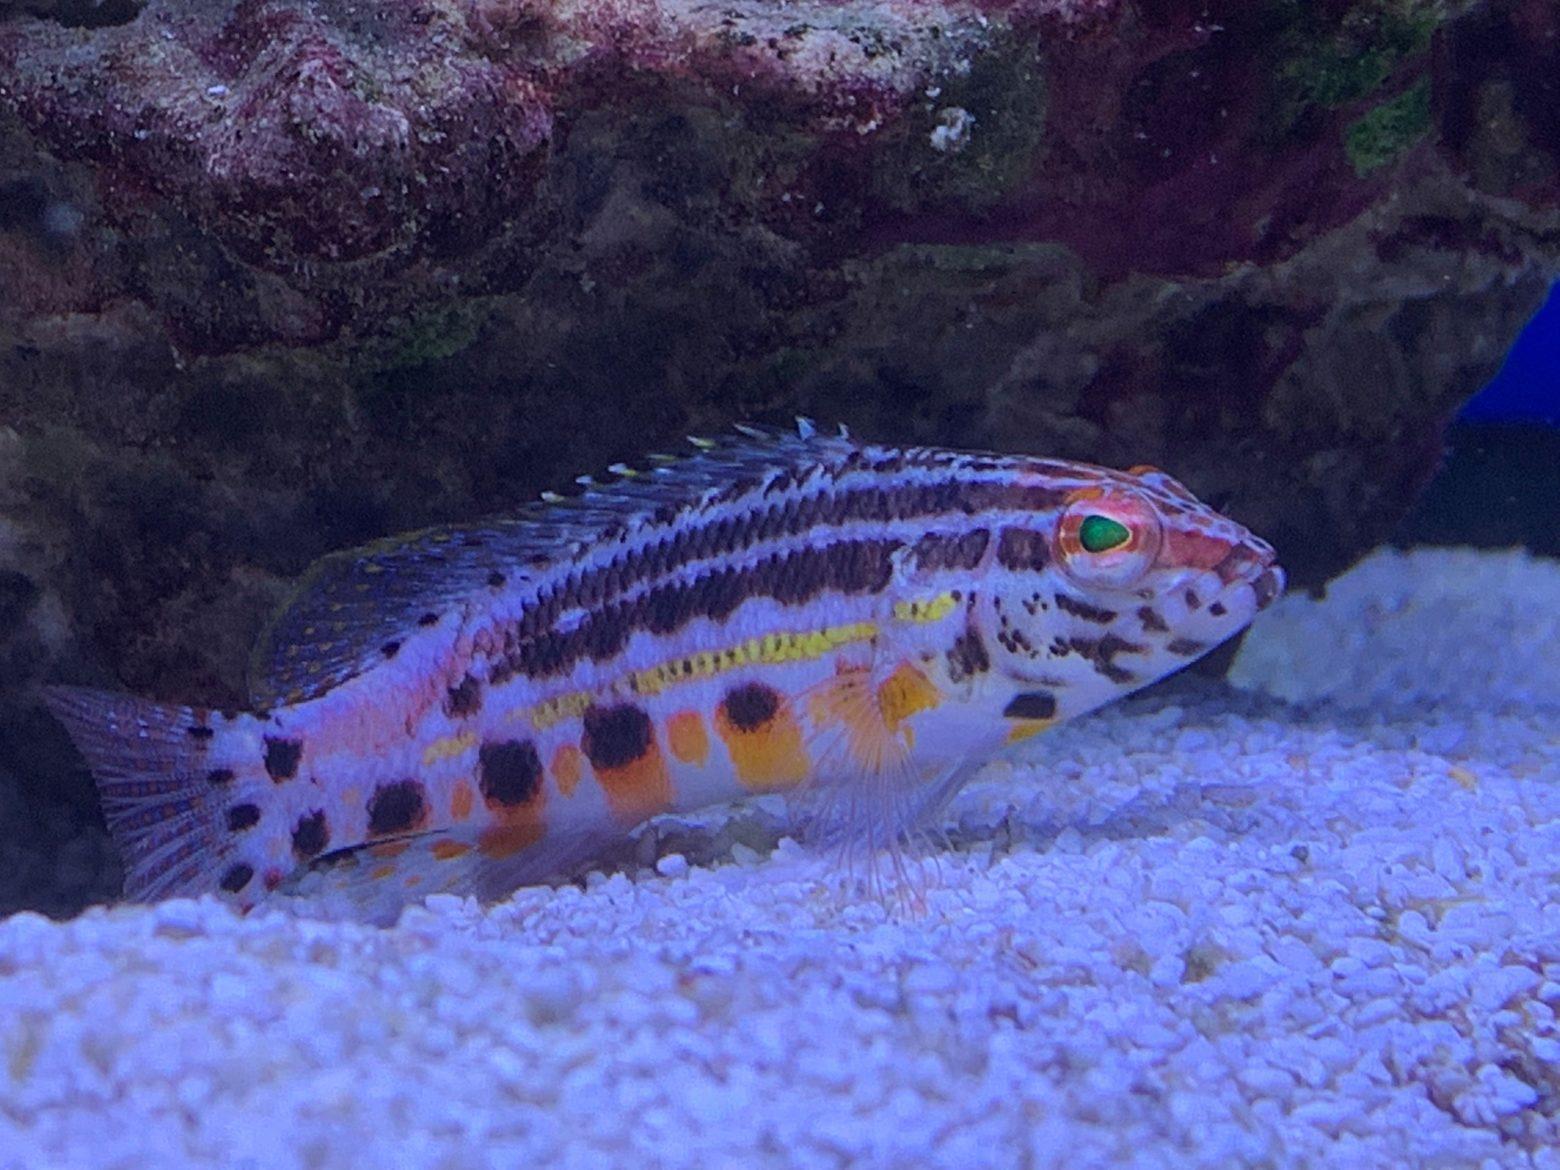 Lantern bass (Serranus baldwini) Ashtead store